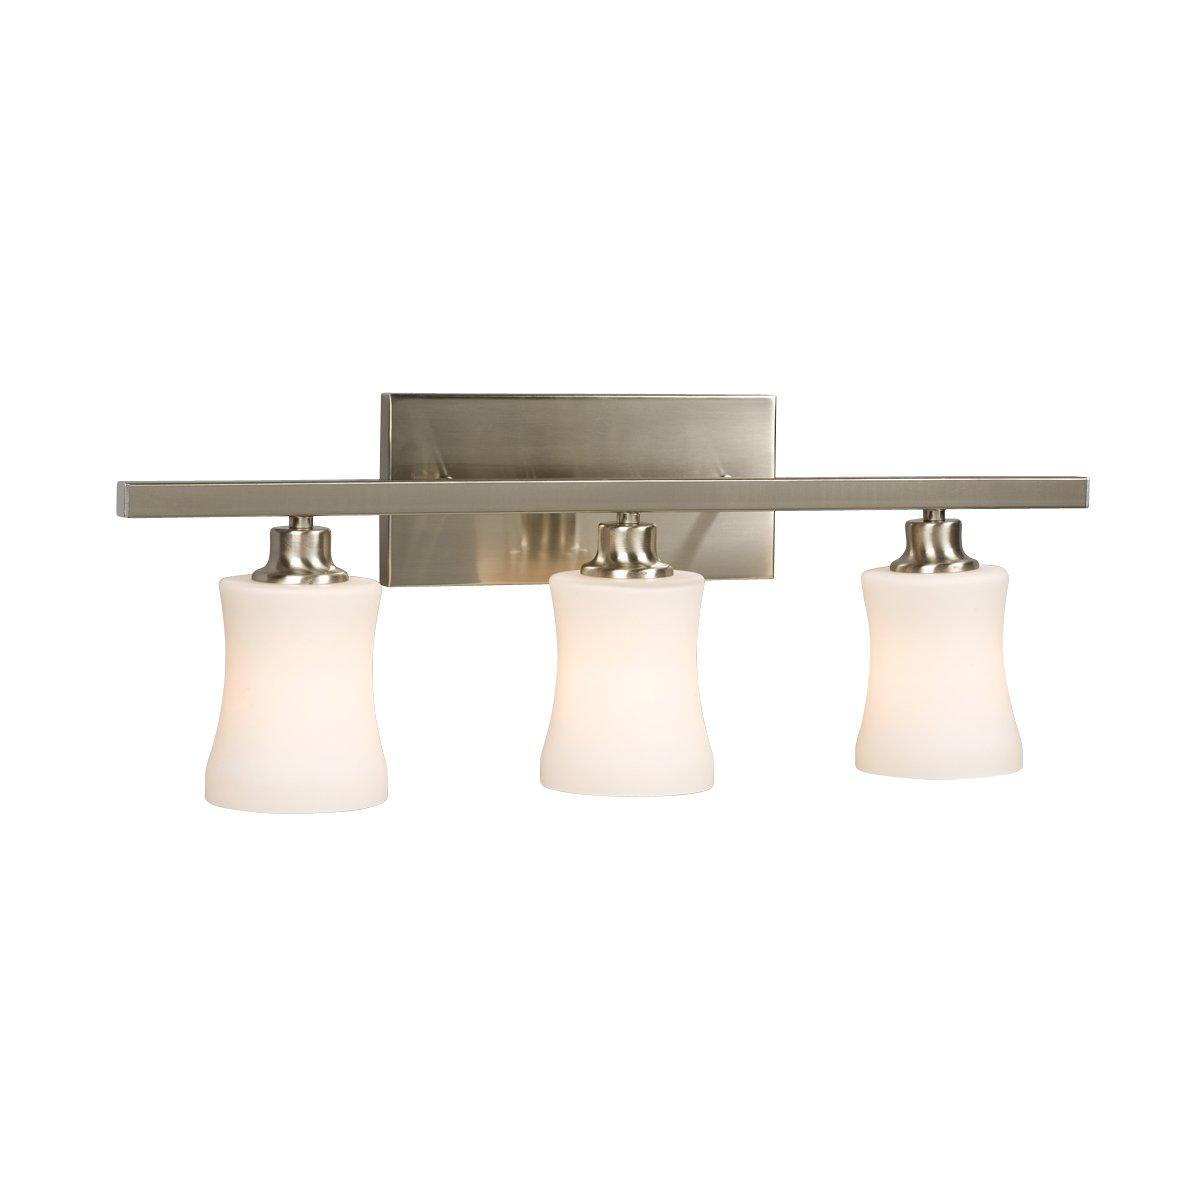 bathroom lamps photo - 1